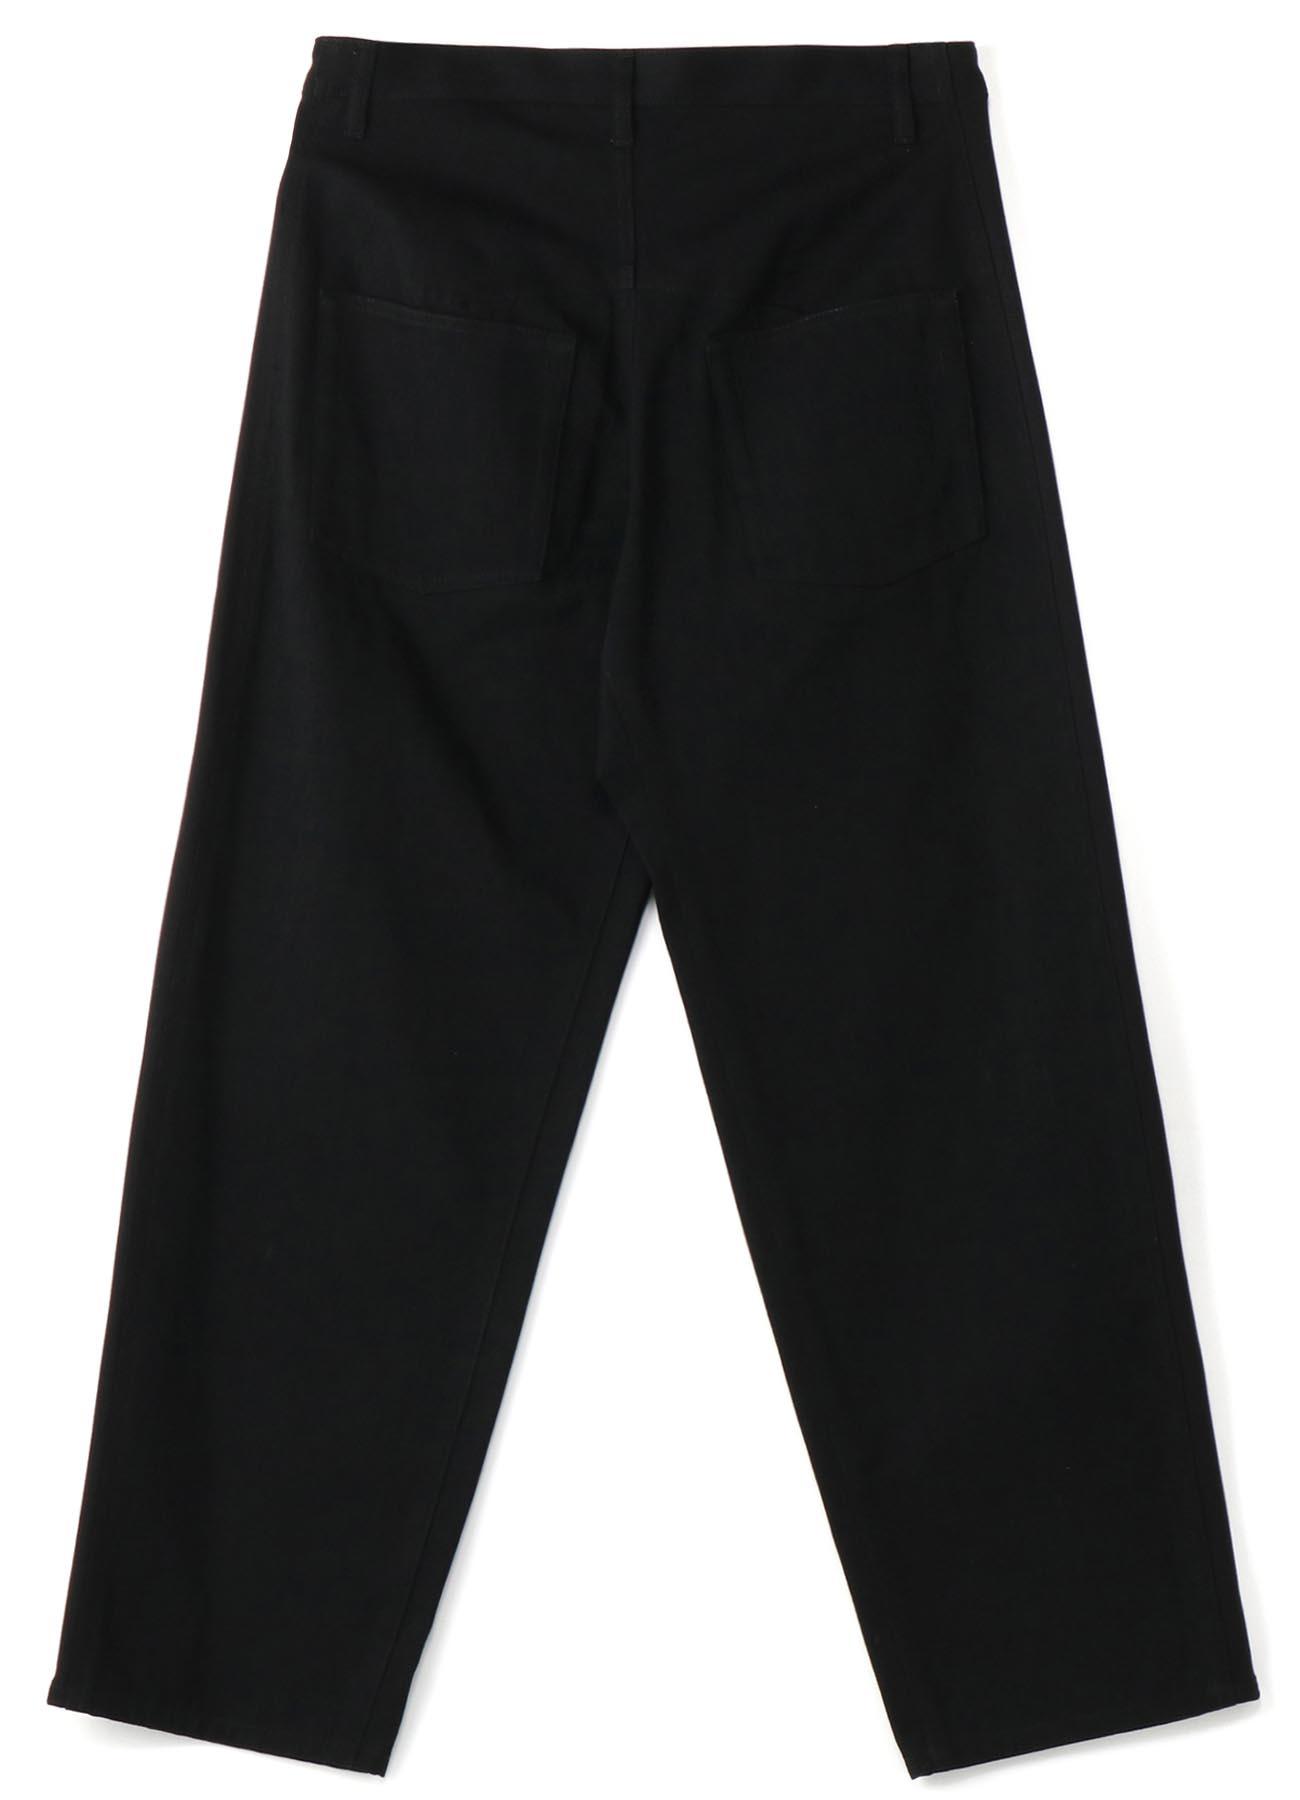 10ozDENIM + COTTON FLEECE SIDE STRIPE PANTS